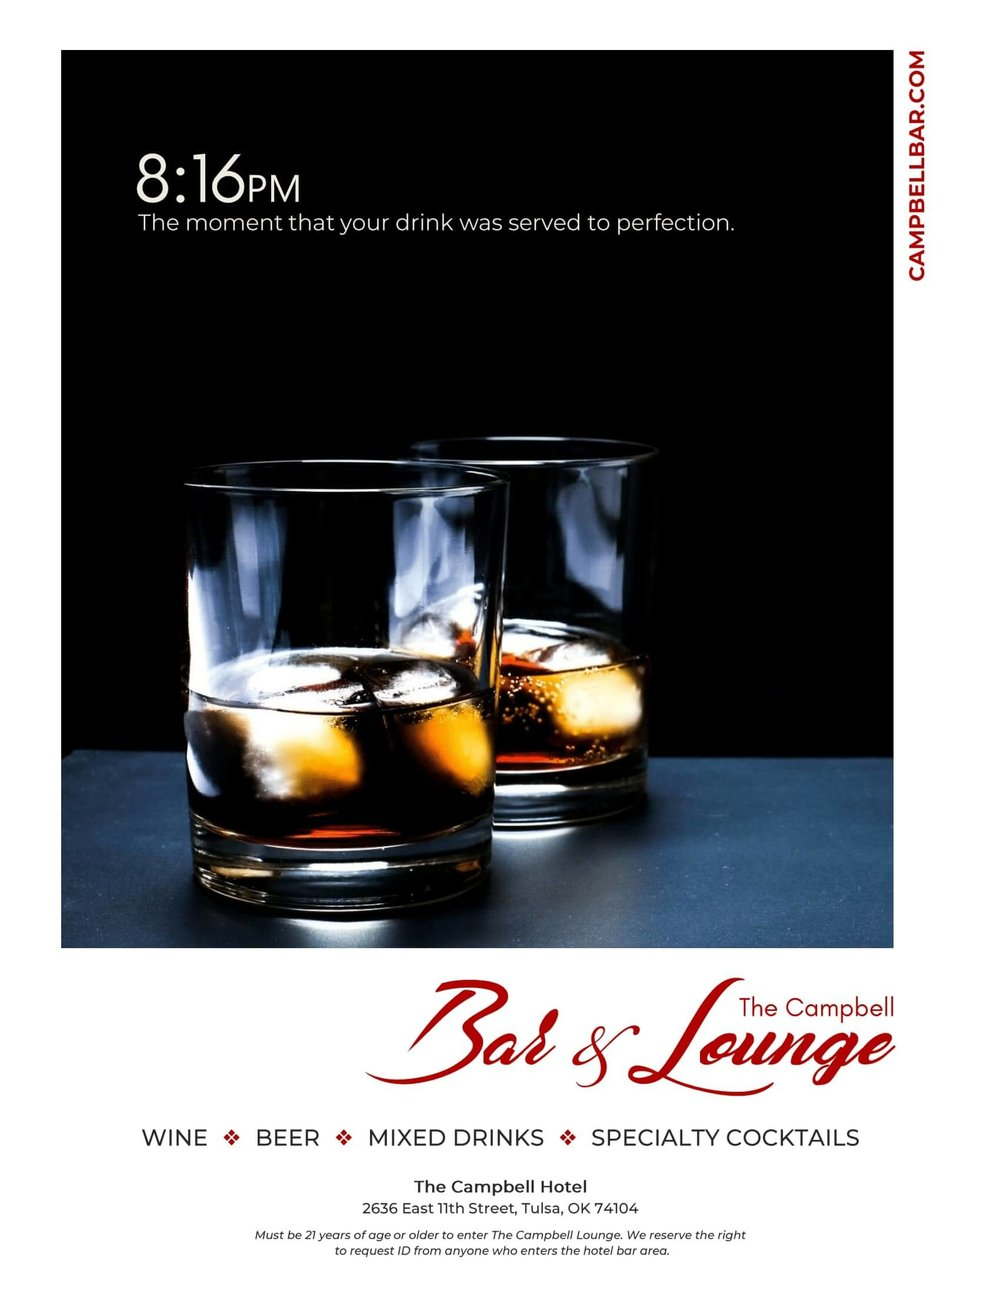 Tulsa Graphic Design Work by Erik Michael Collins for Local Hotel Bar